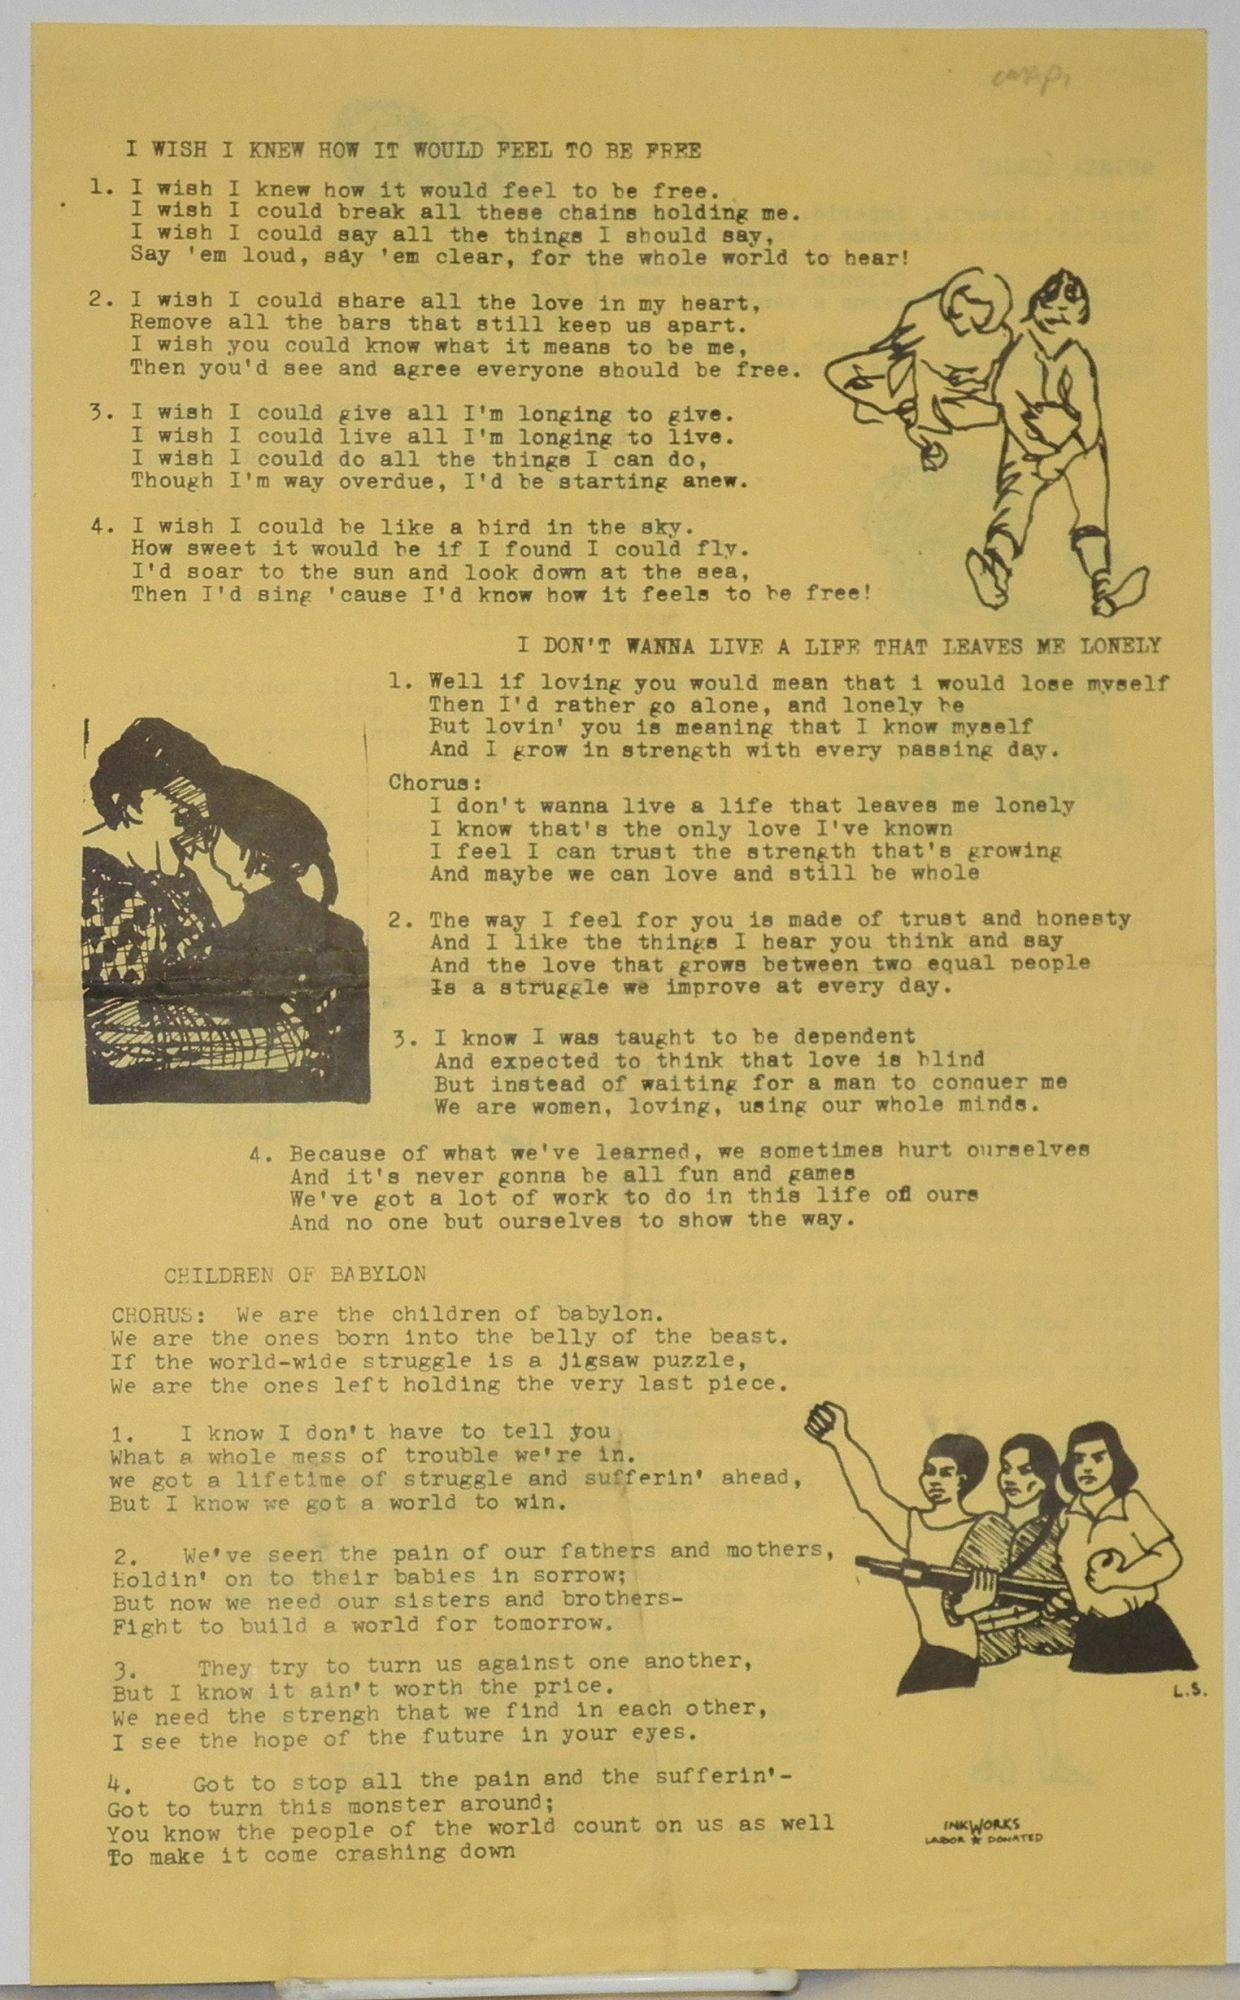 Sing-along sheet with lyrics to six feminist